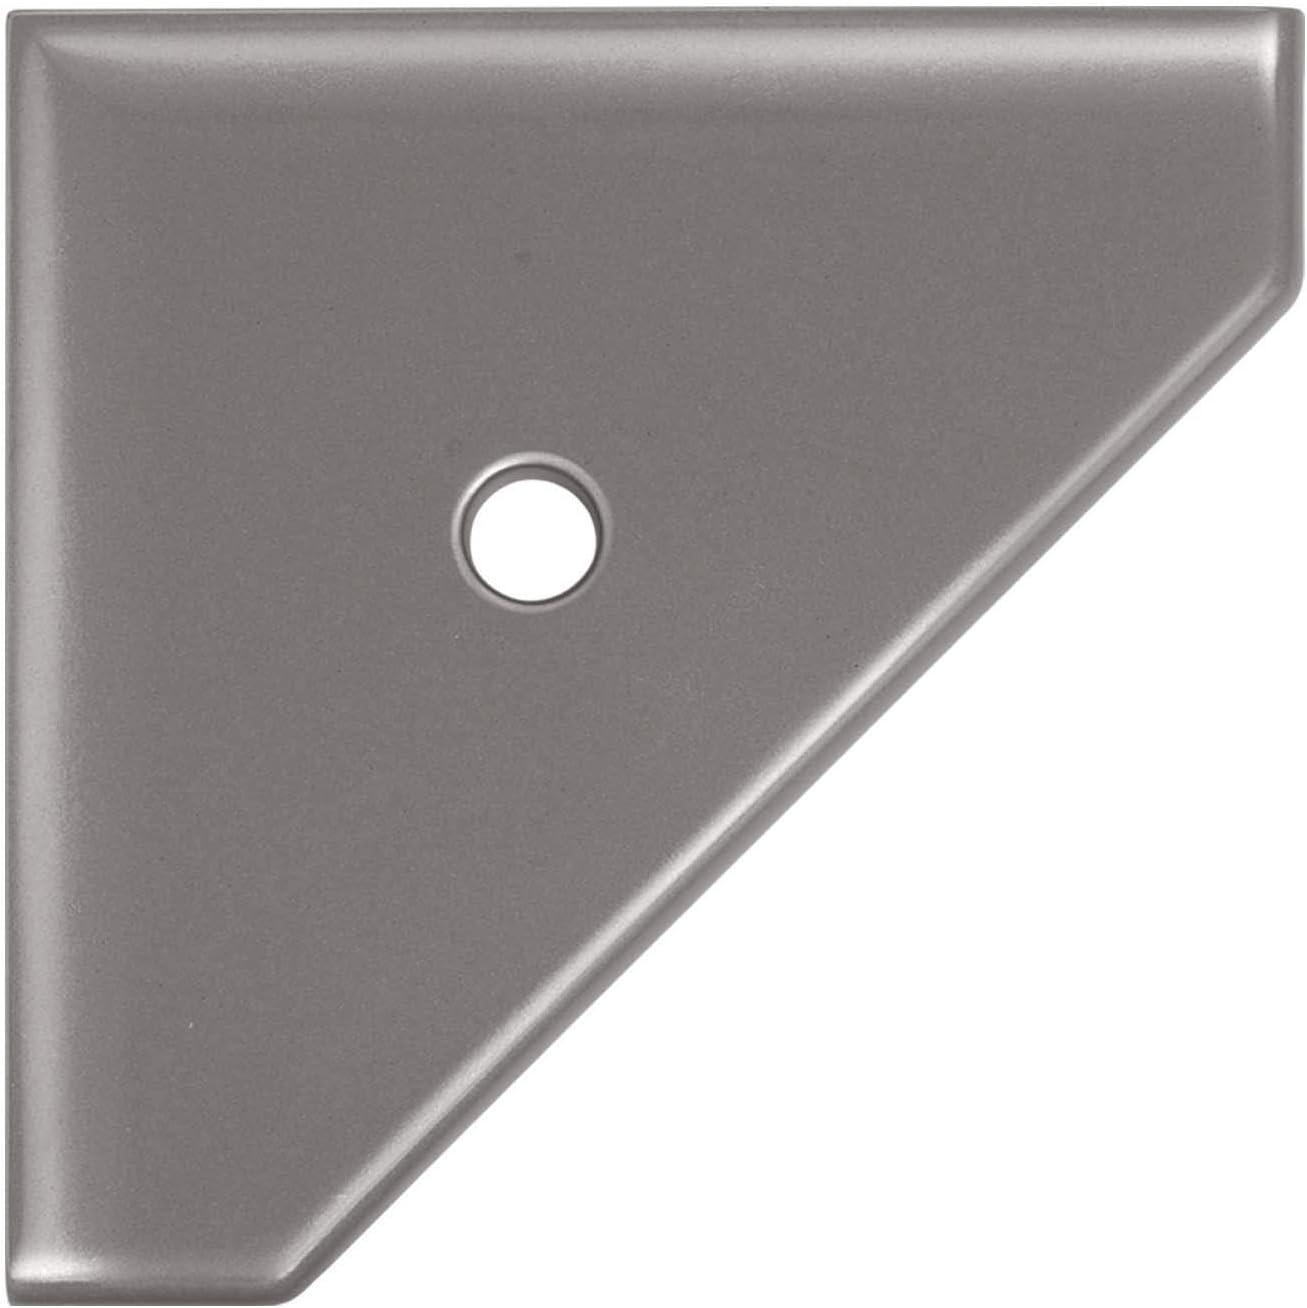 8 Discount mail order inch Corner Award-winning store Shower Shelf - Cast Nickel Wall Brushed Moun Metal